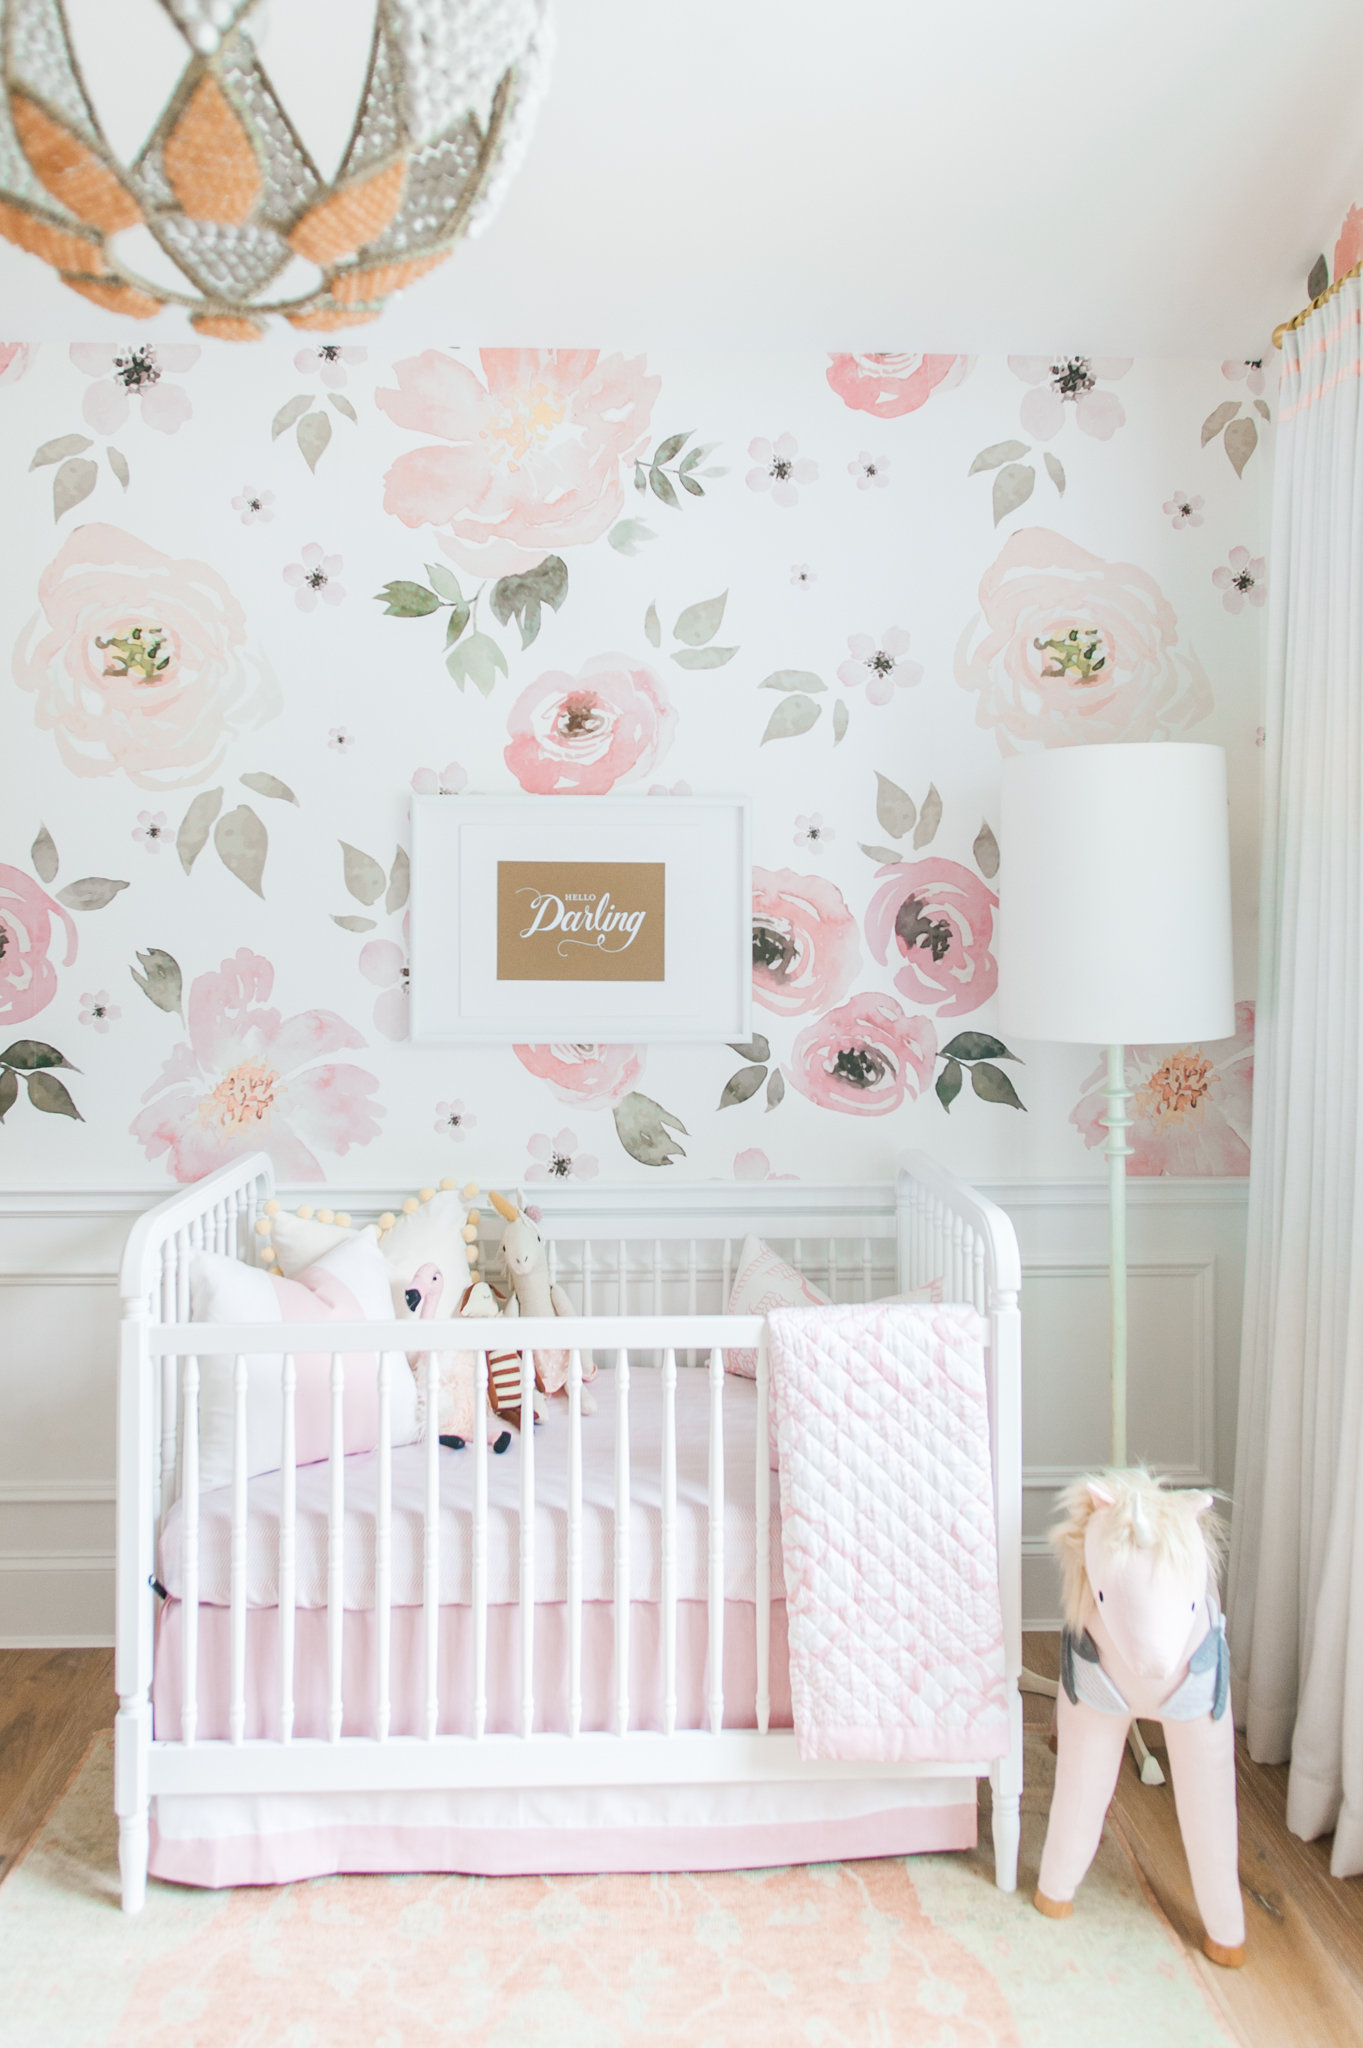 Cute Elephant Design Wallpaper Lillya S Nursery Amp Giveaway Monika Hibbs